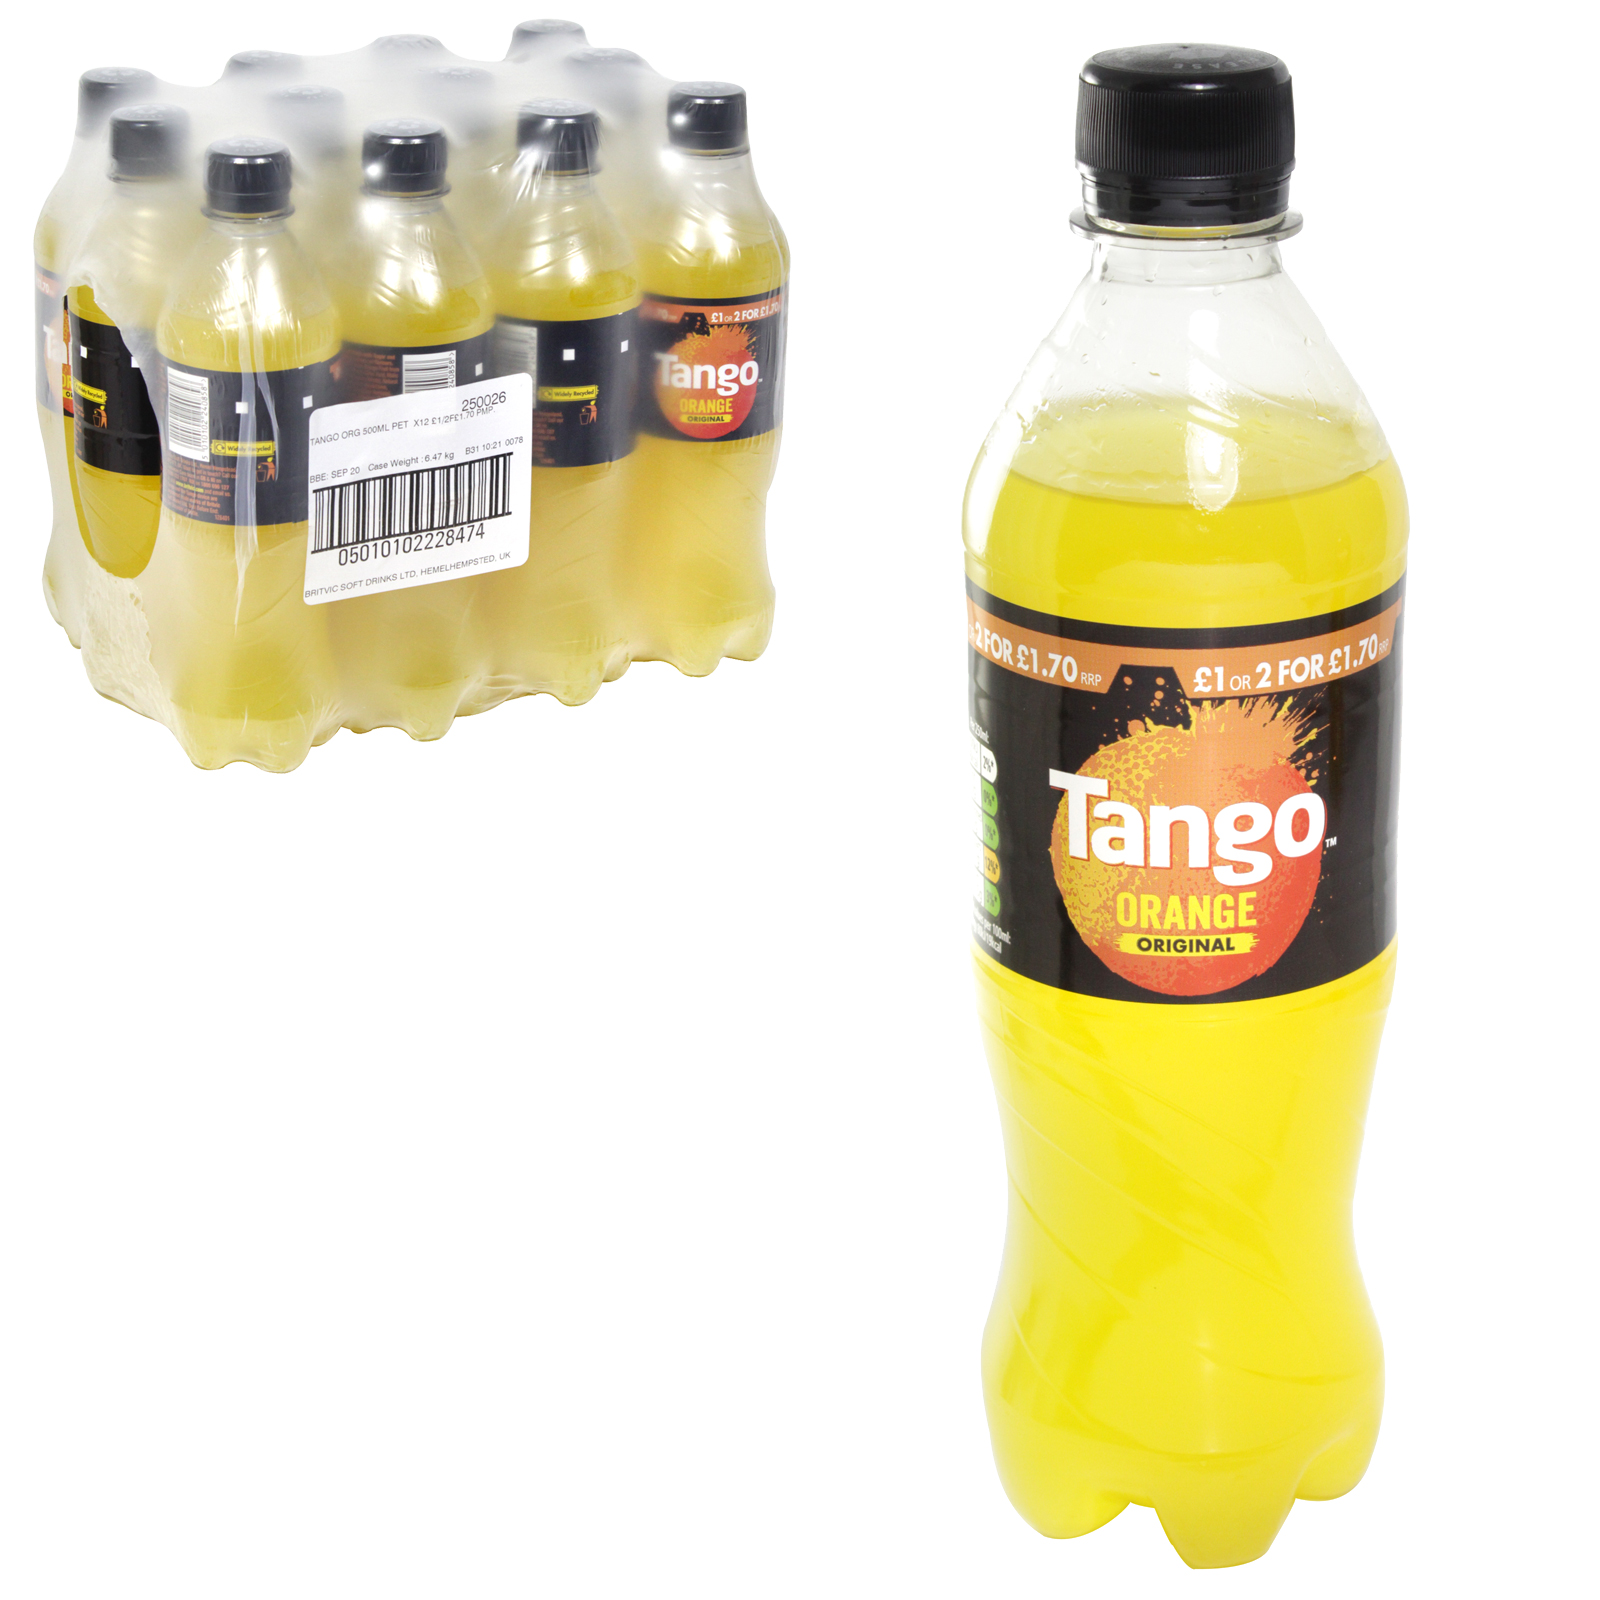 TANGO ORANGE BOTTLES 500ML PM?1 OR 2 ?1.70 X12